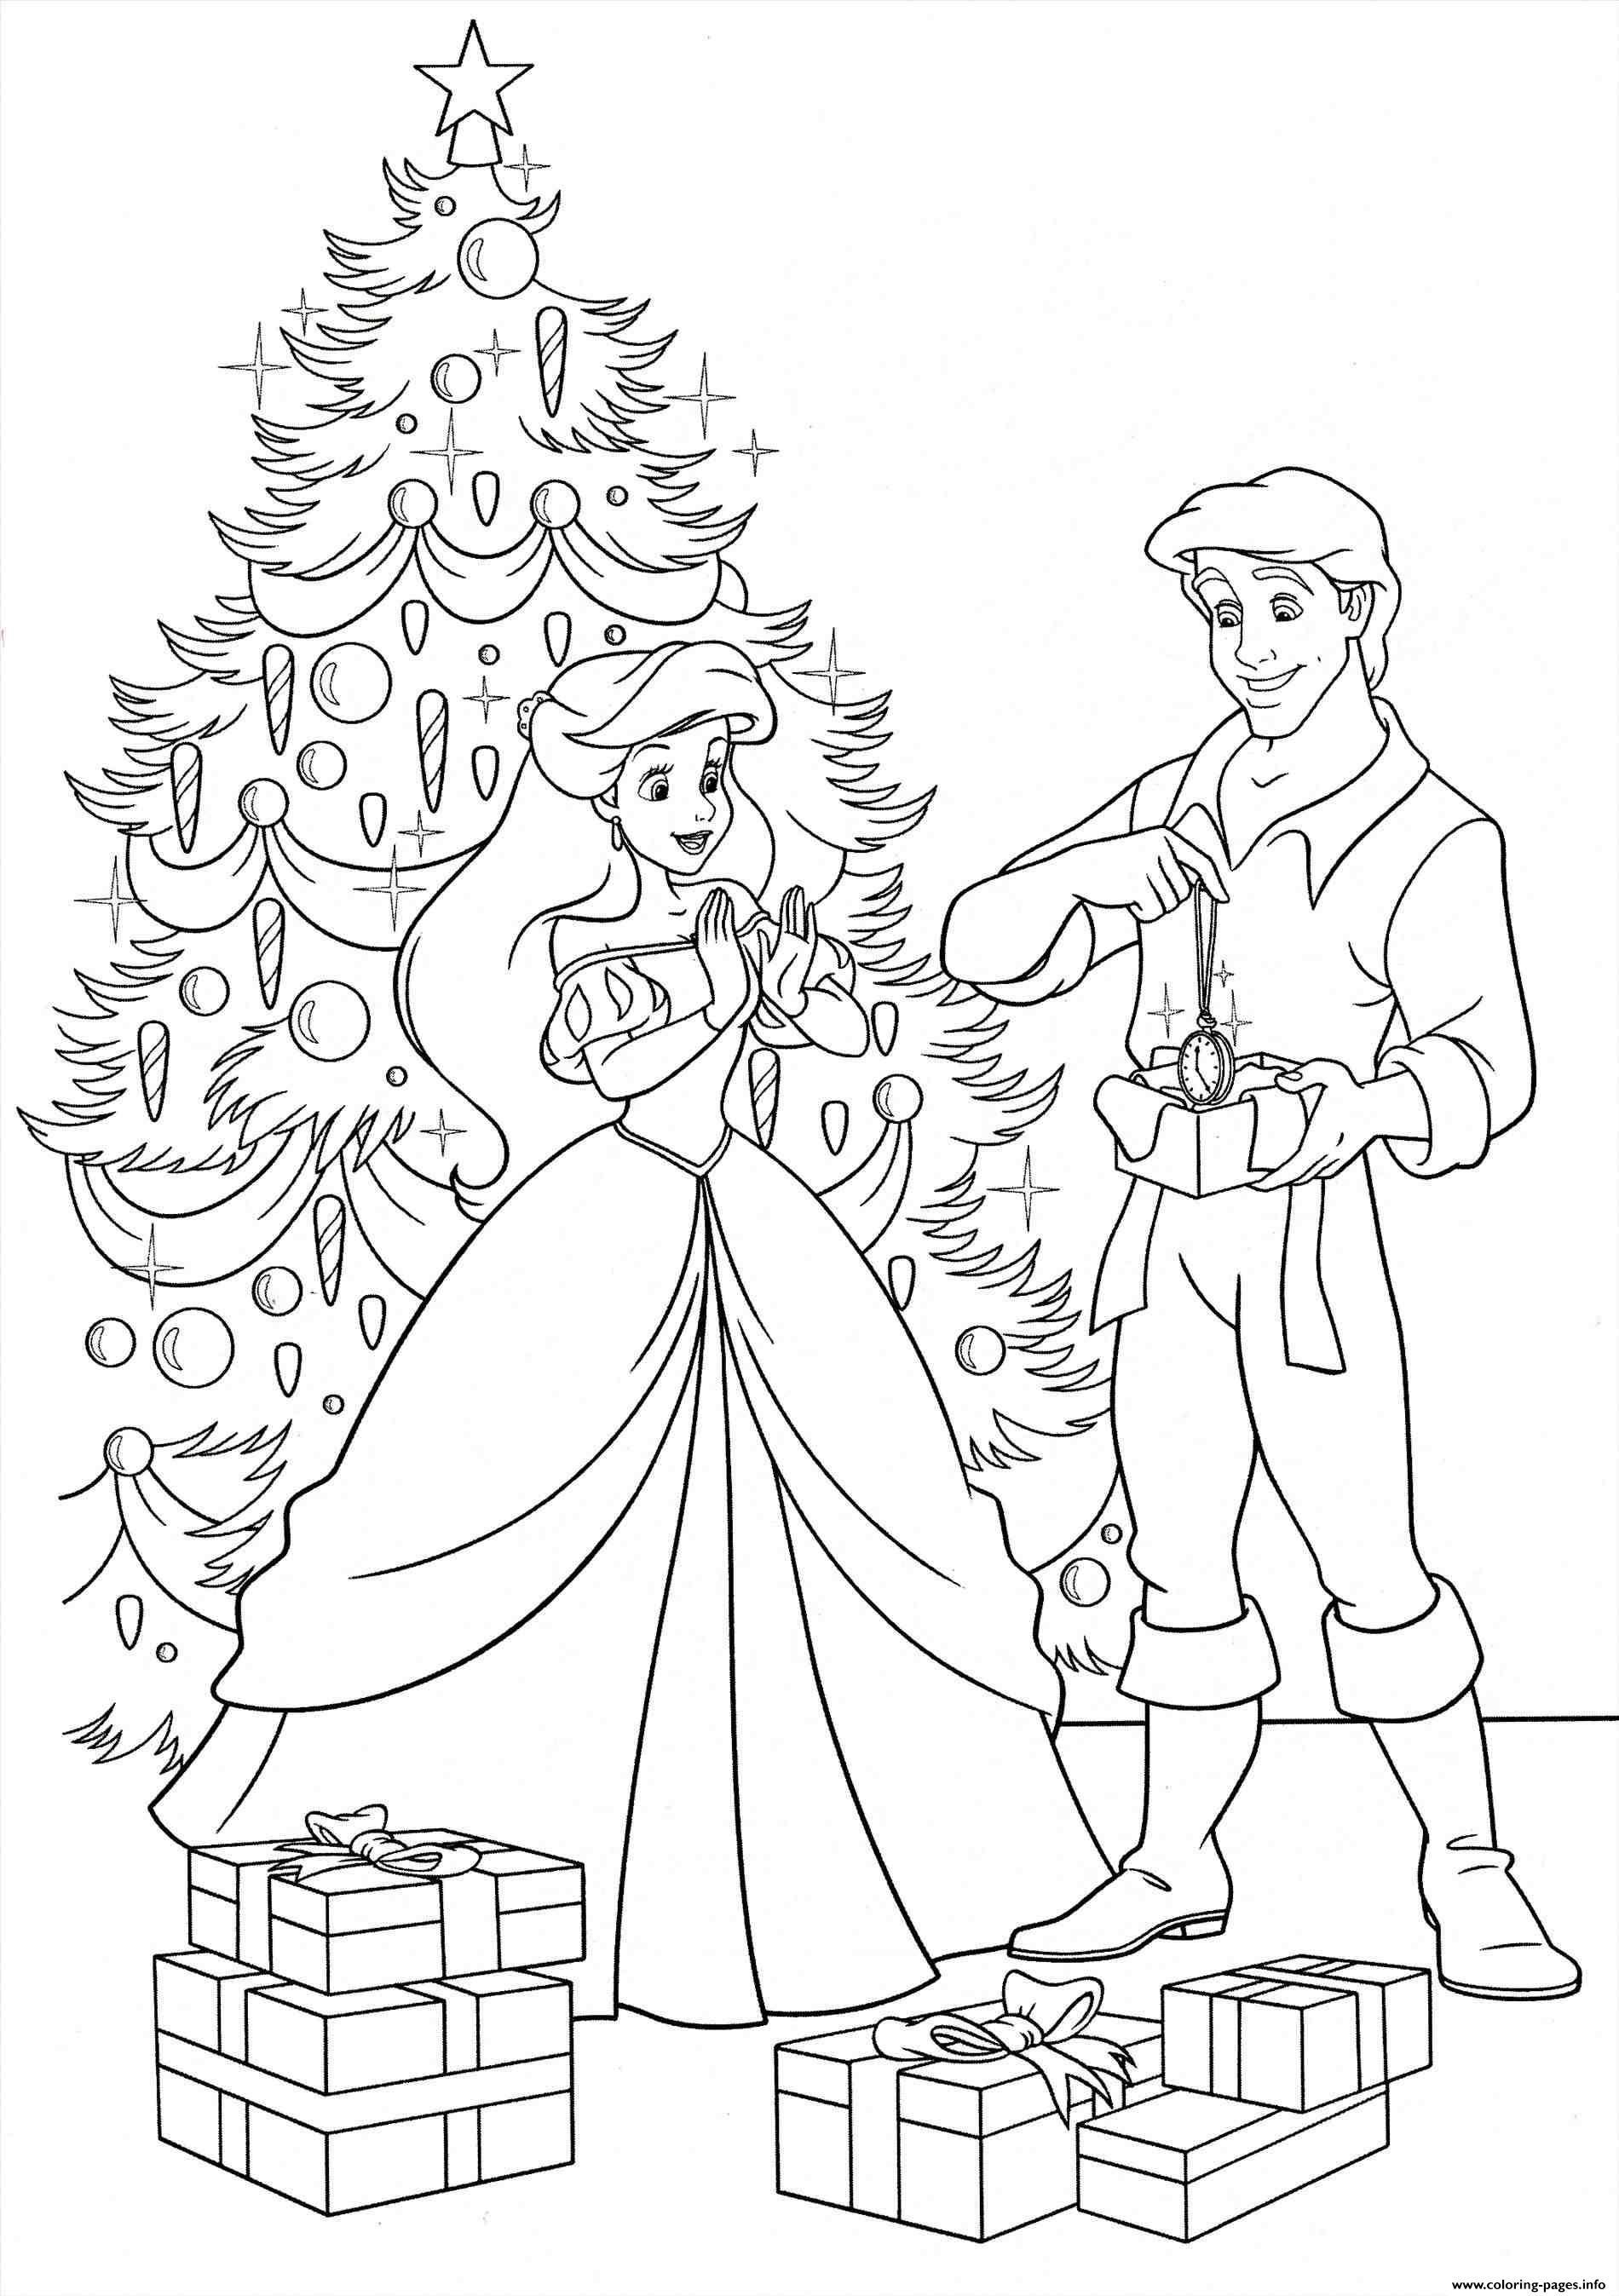 Print Disney Princess Christmas Gifts Coloring Pages Mermaid Coloring Pages Disney Princess Coloring Pages Princess Coloring Pages